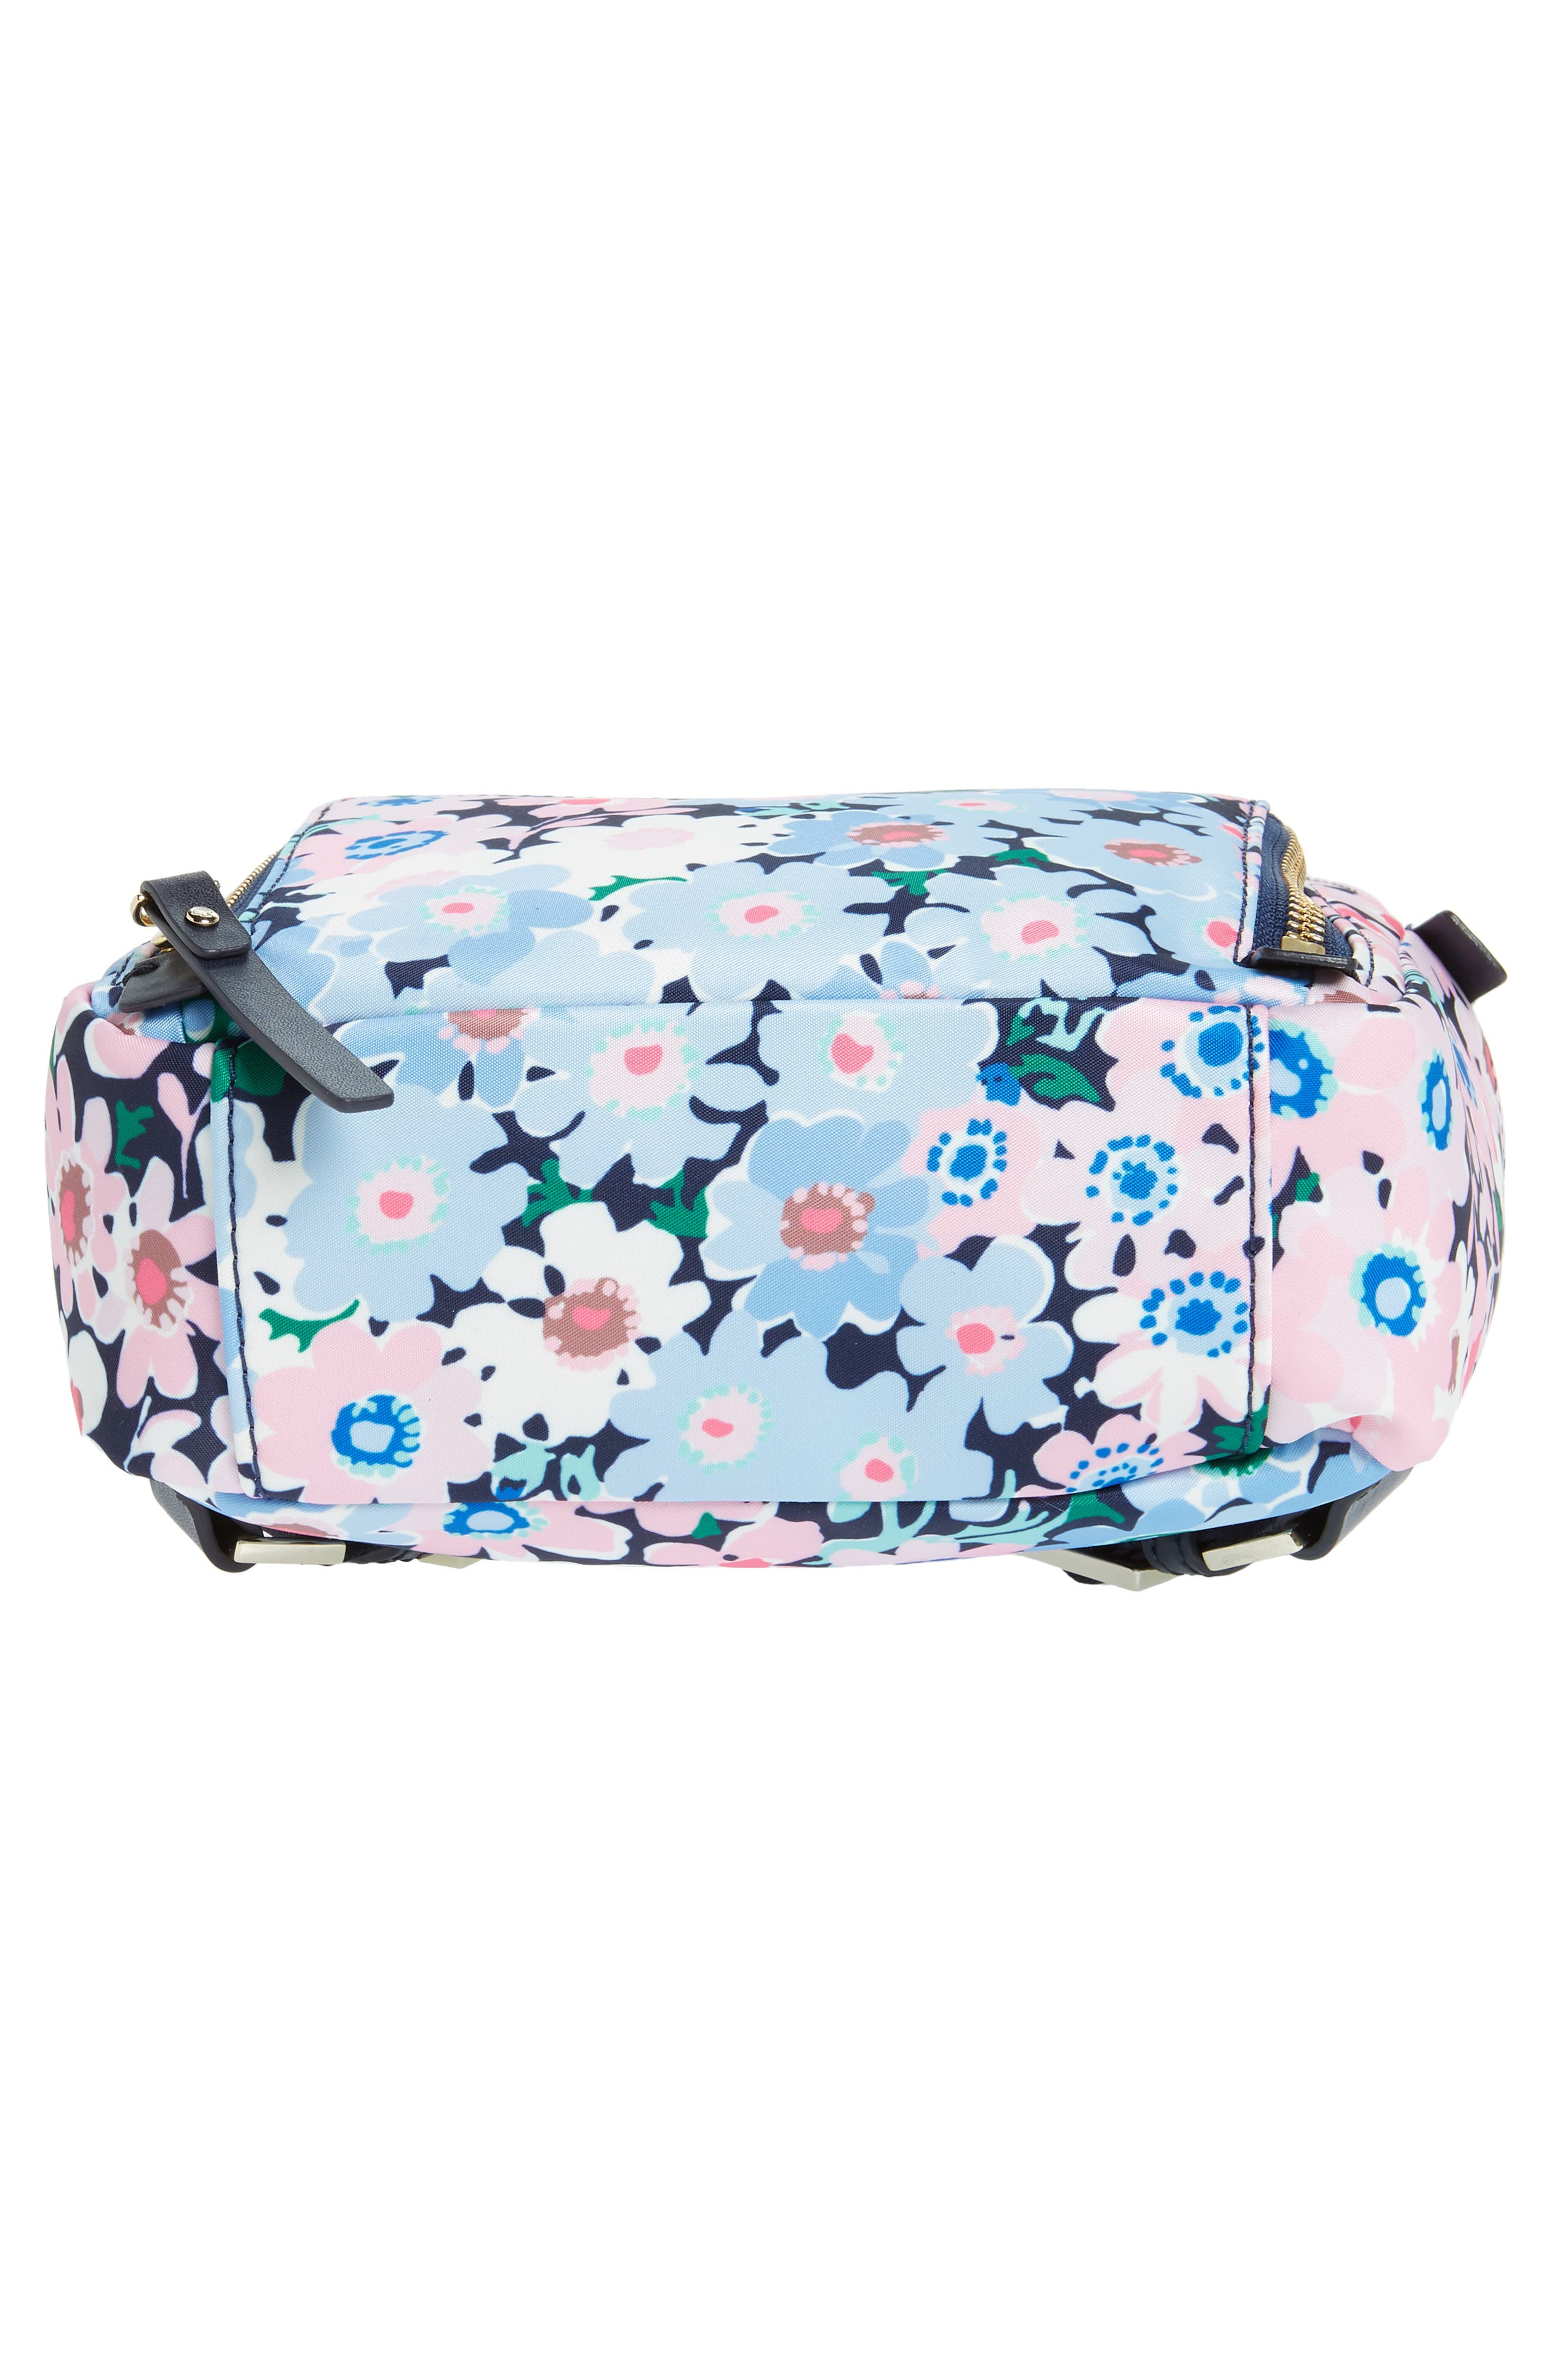 watson lane - daisy garden small hartley backpack,                             Alternate thumbnail 6, color,                             400